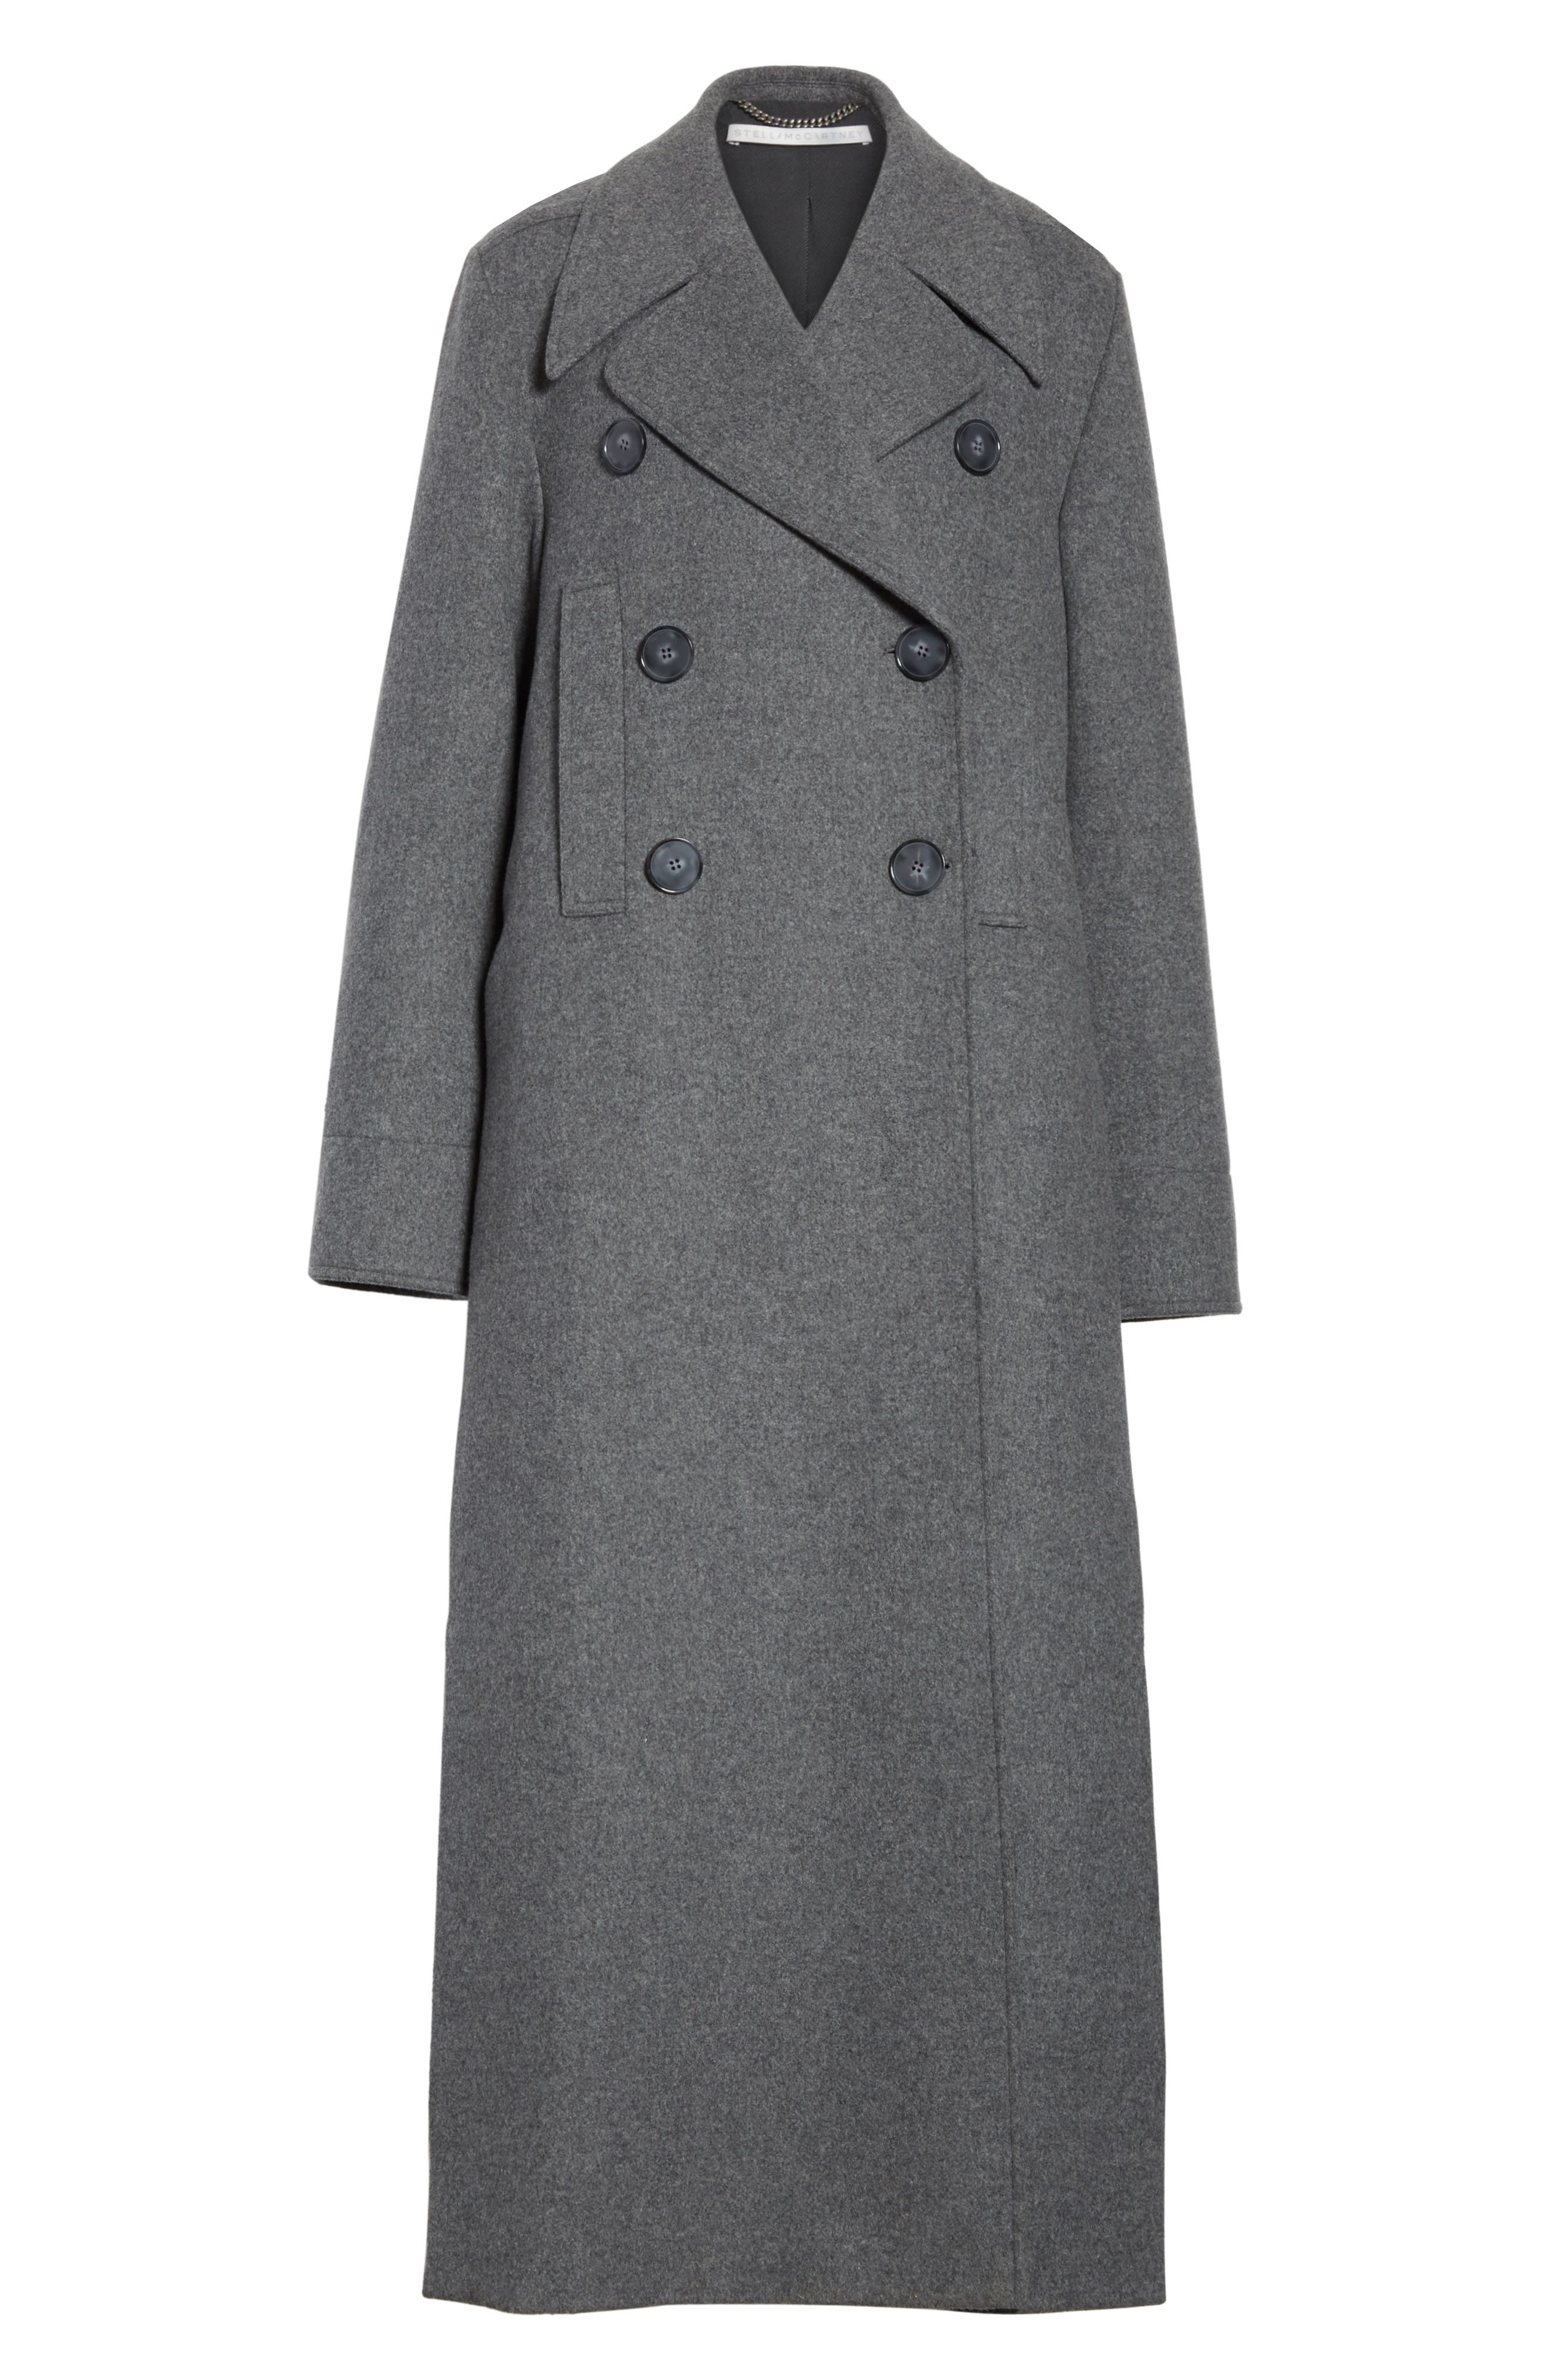 Edwina Long Double Breasted Wool Blend Coat,                             Alternate thumbnail 5, color,                             076